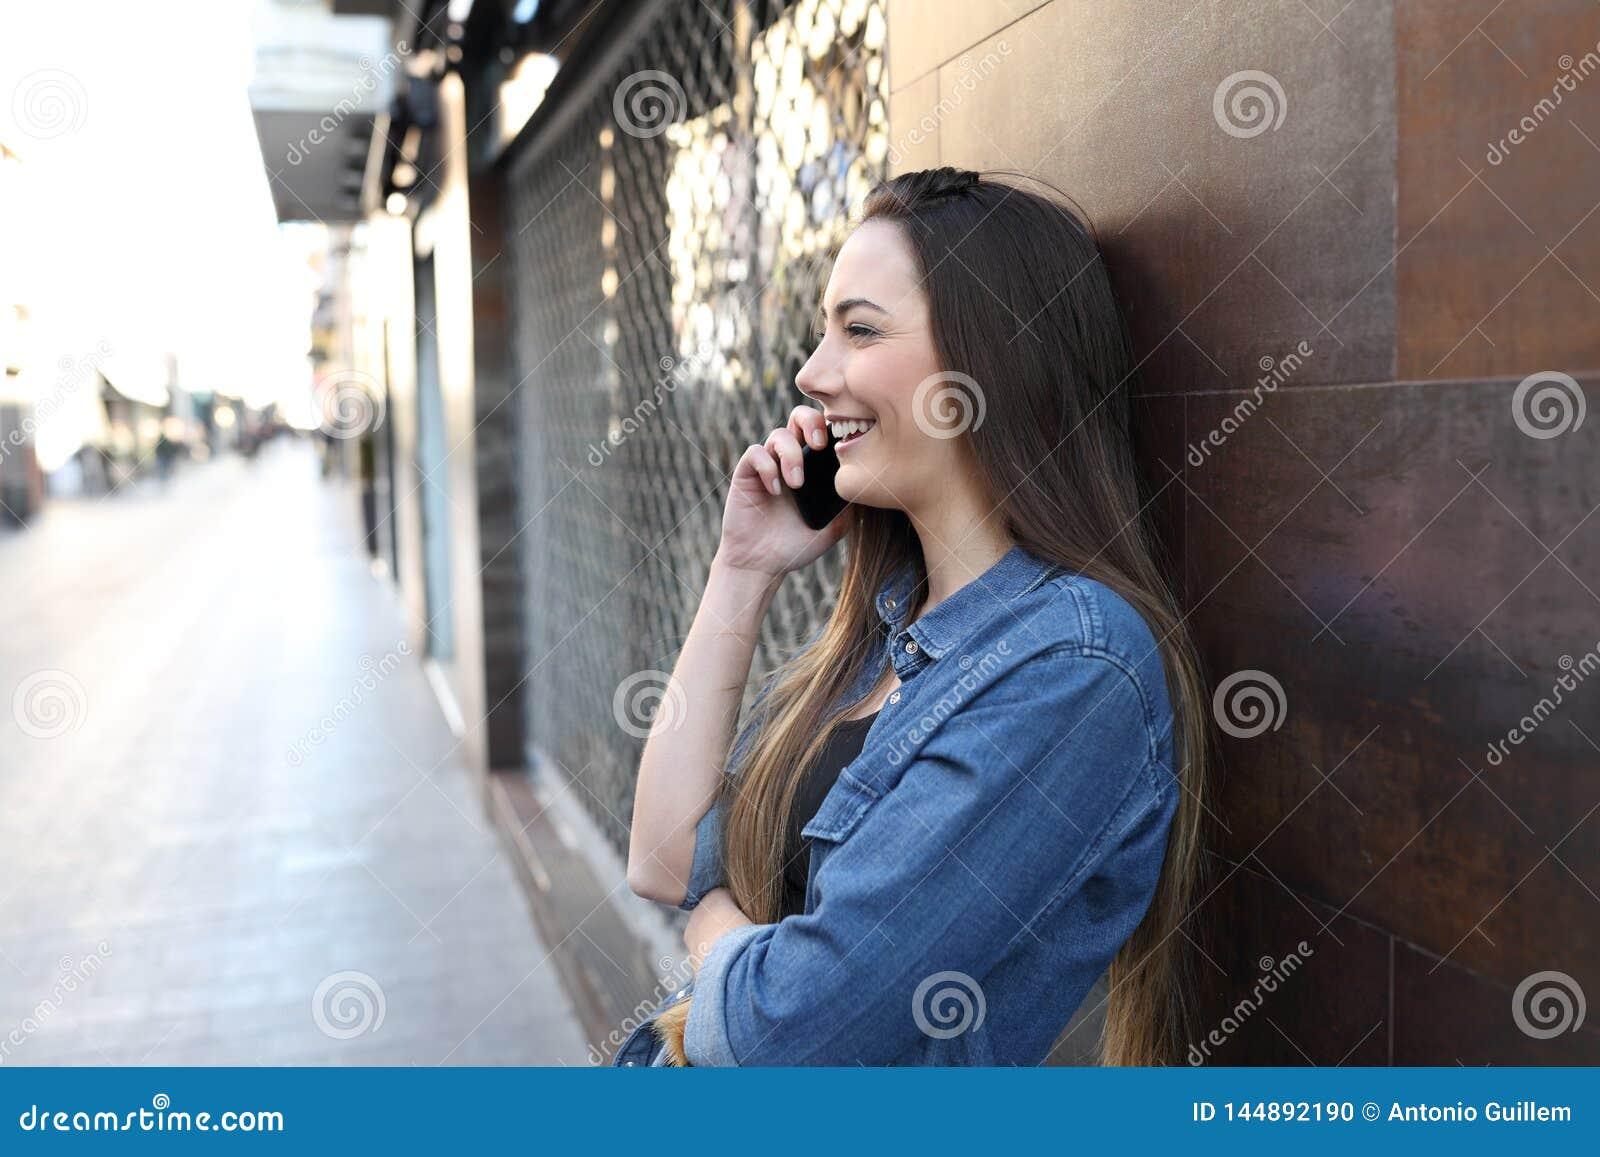 Gelukkig meisjesprofiel dat op telefoon in de straat spreekt